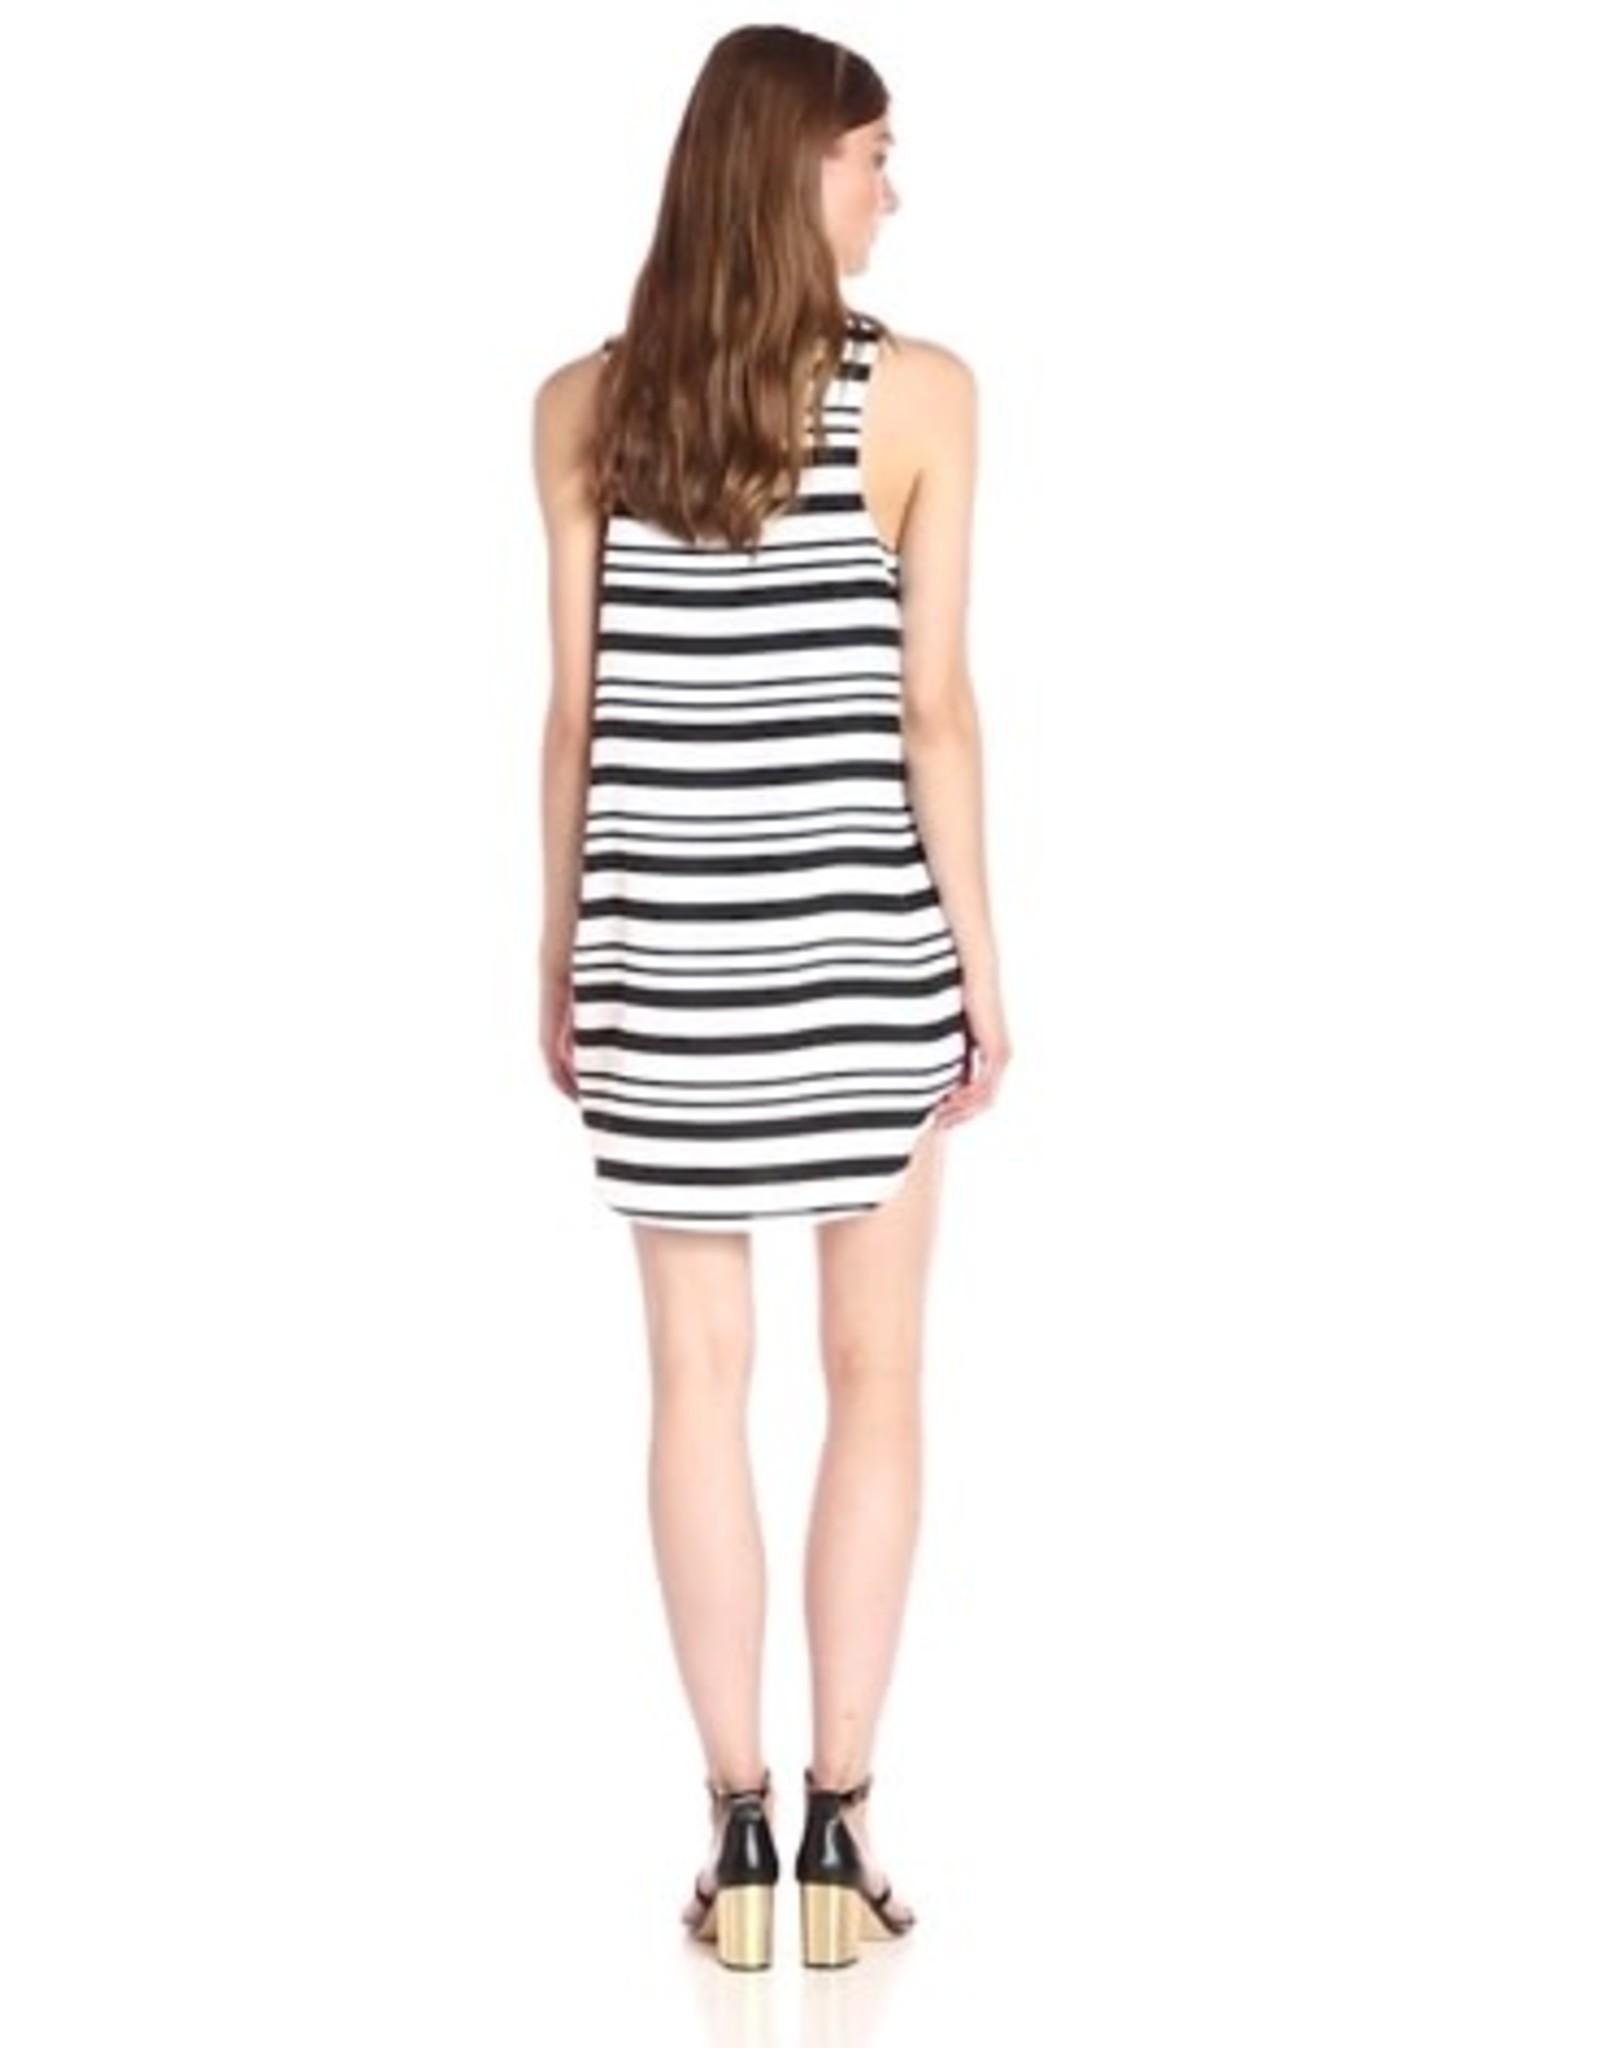 Striped Scoop Neck Tank Dress